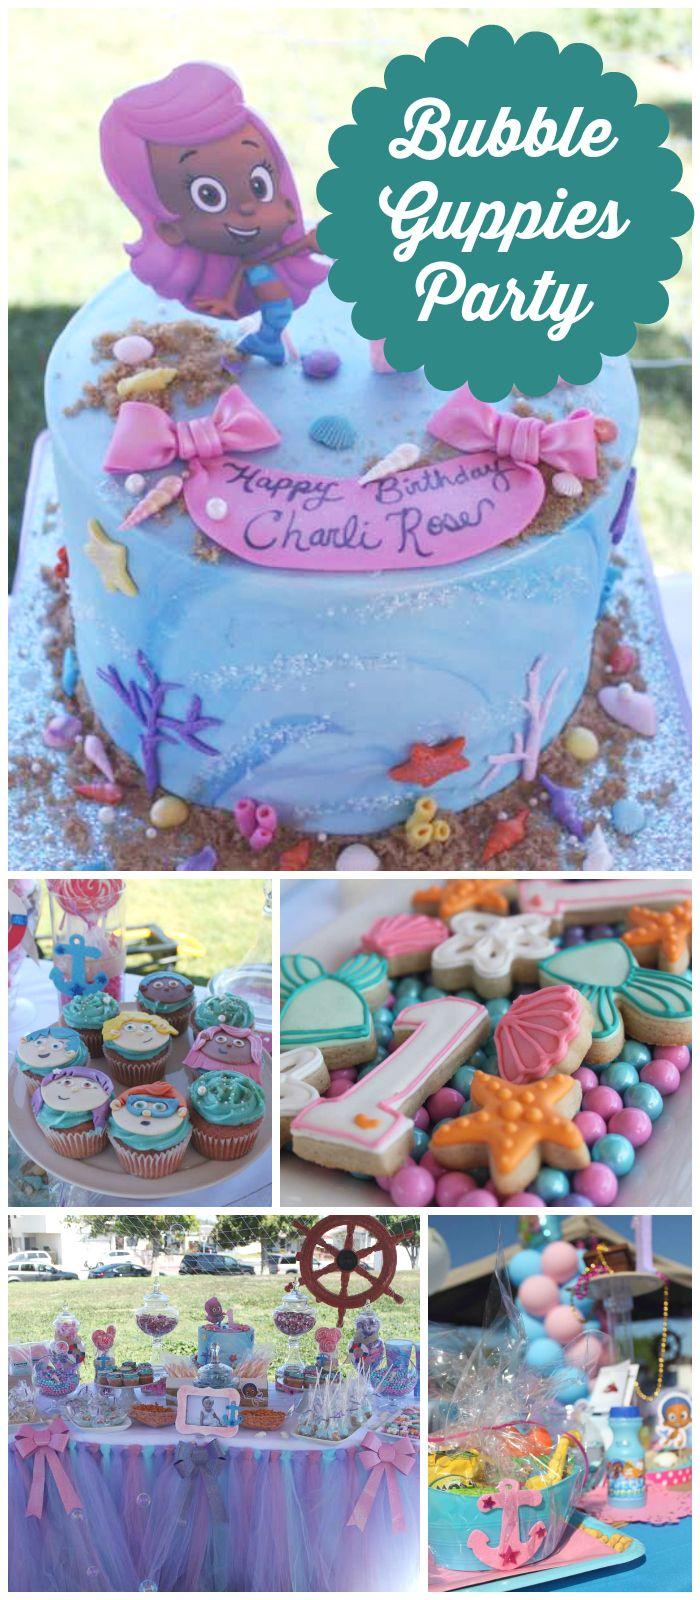 Bubble Guppies Birthday Charli Rose S 1st Birthday Catch My Party Bubble Guppies Birthday Bubble Guppies Party 2nd Birthday Party For Girl